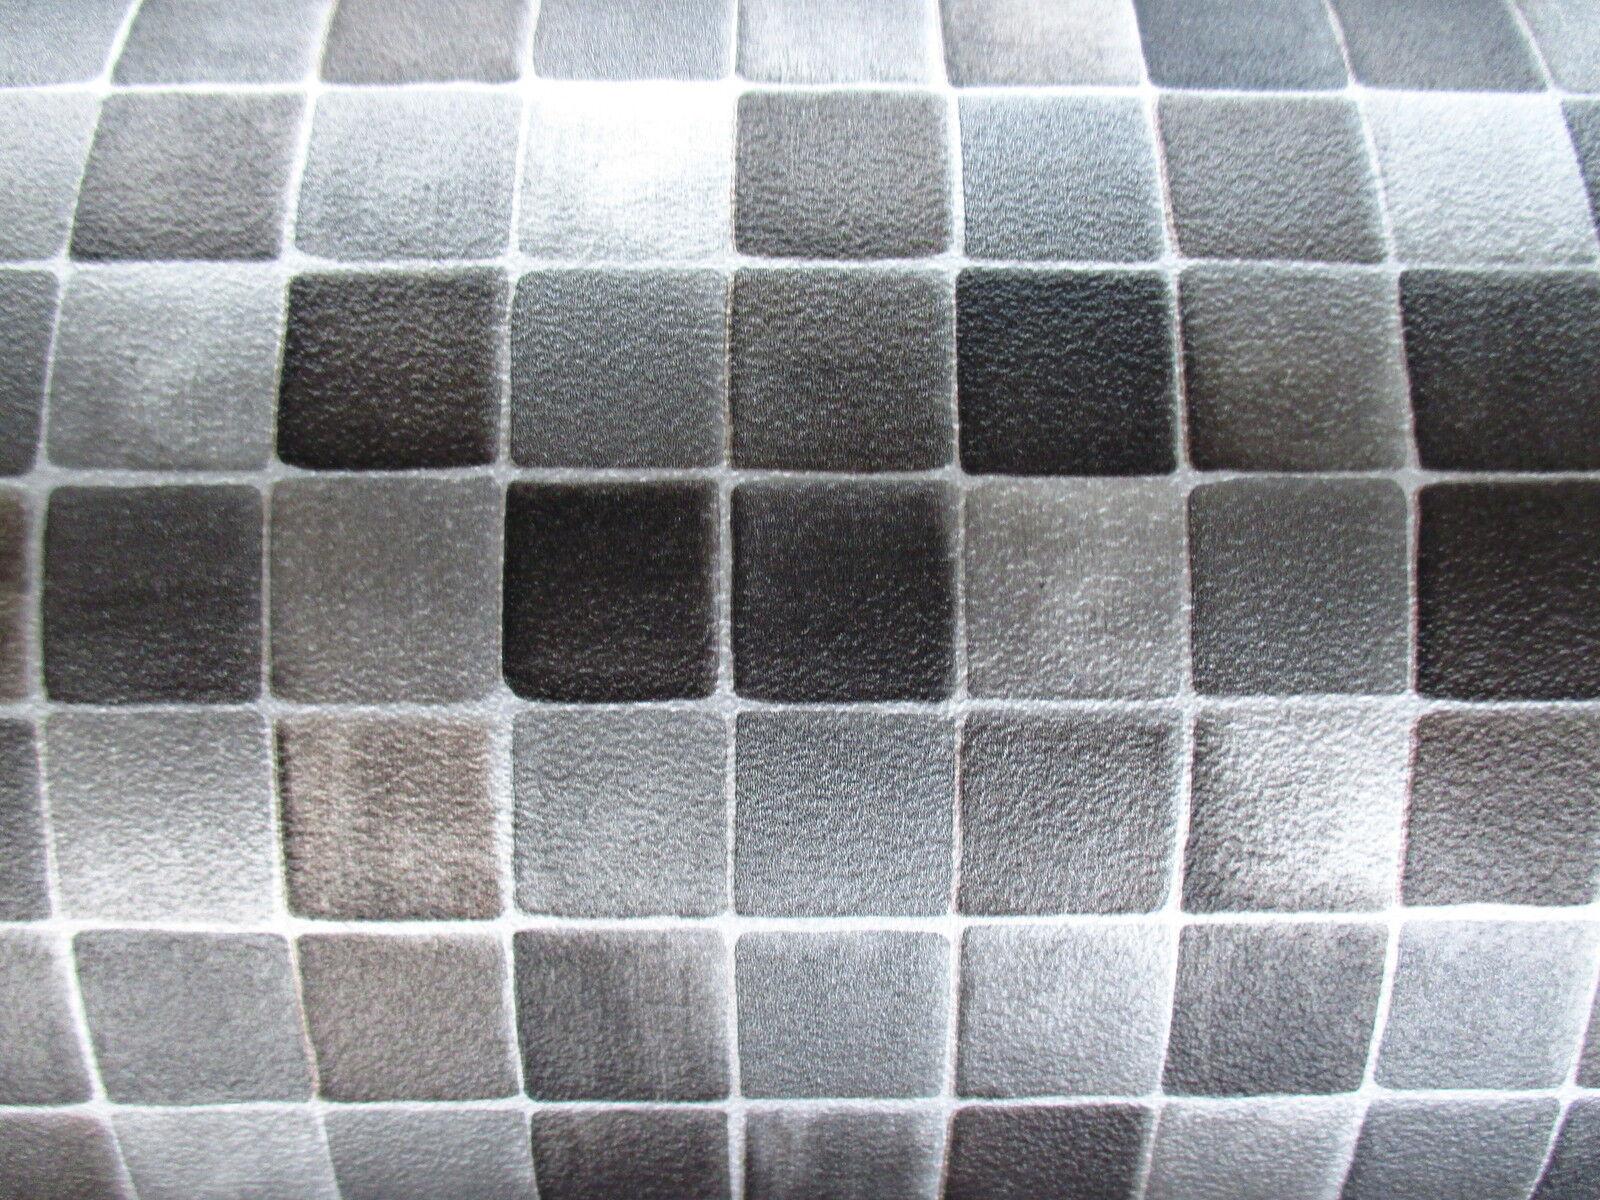 PVC  /m² CV Bodenbelag Mosaik Fliese anthrazit silber grau 300 x 200 cm